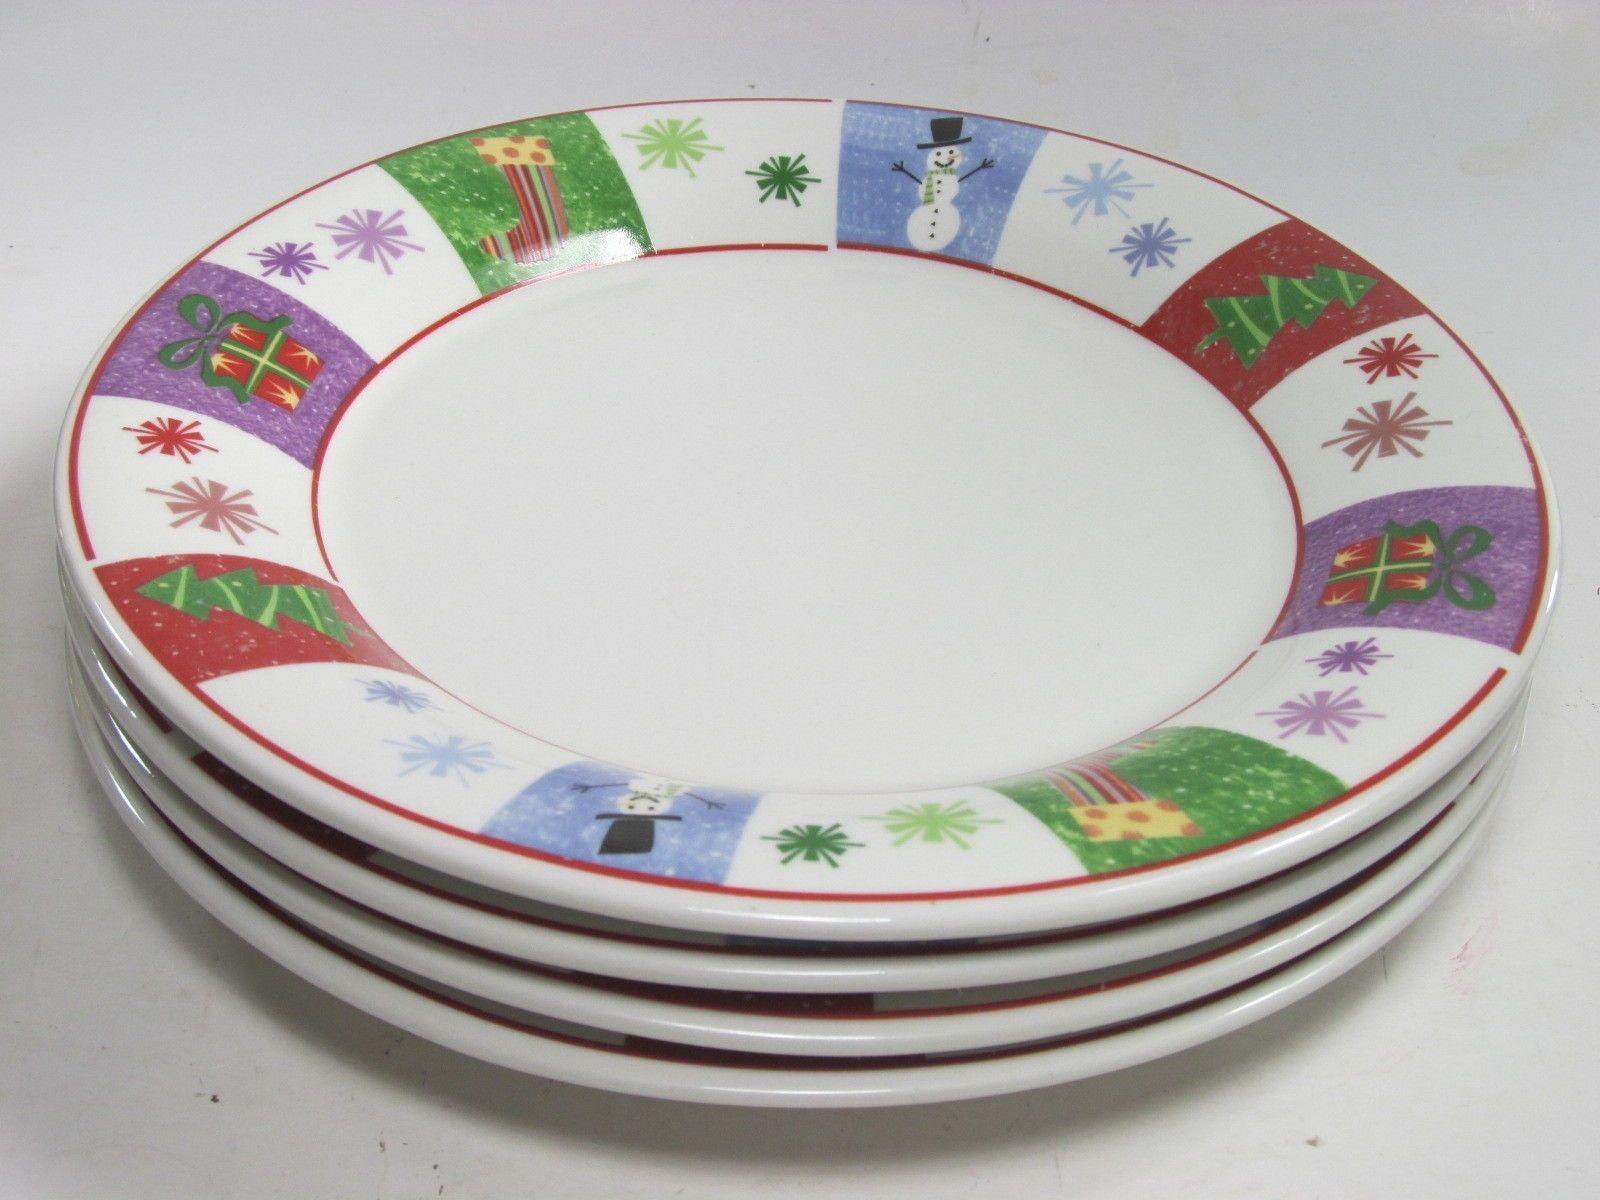 ... Oneida Holiday Surprise Casual Settings Dinner Plate/s 10  & Oneida Holiday Surprise Casual Settings and 31 similar items